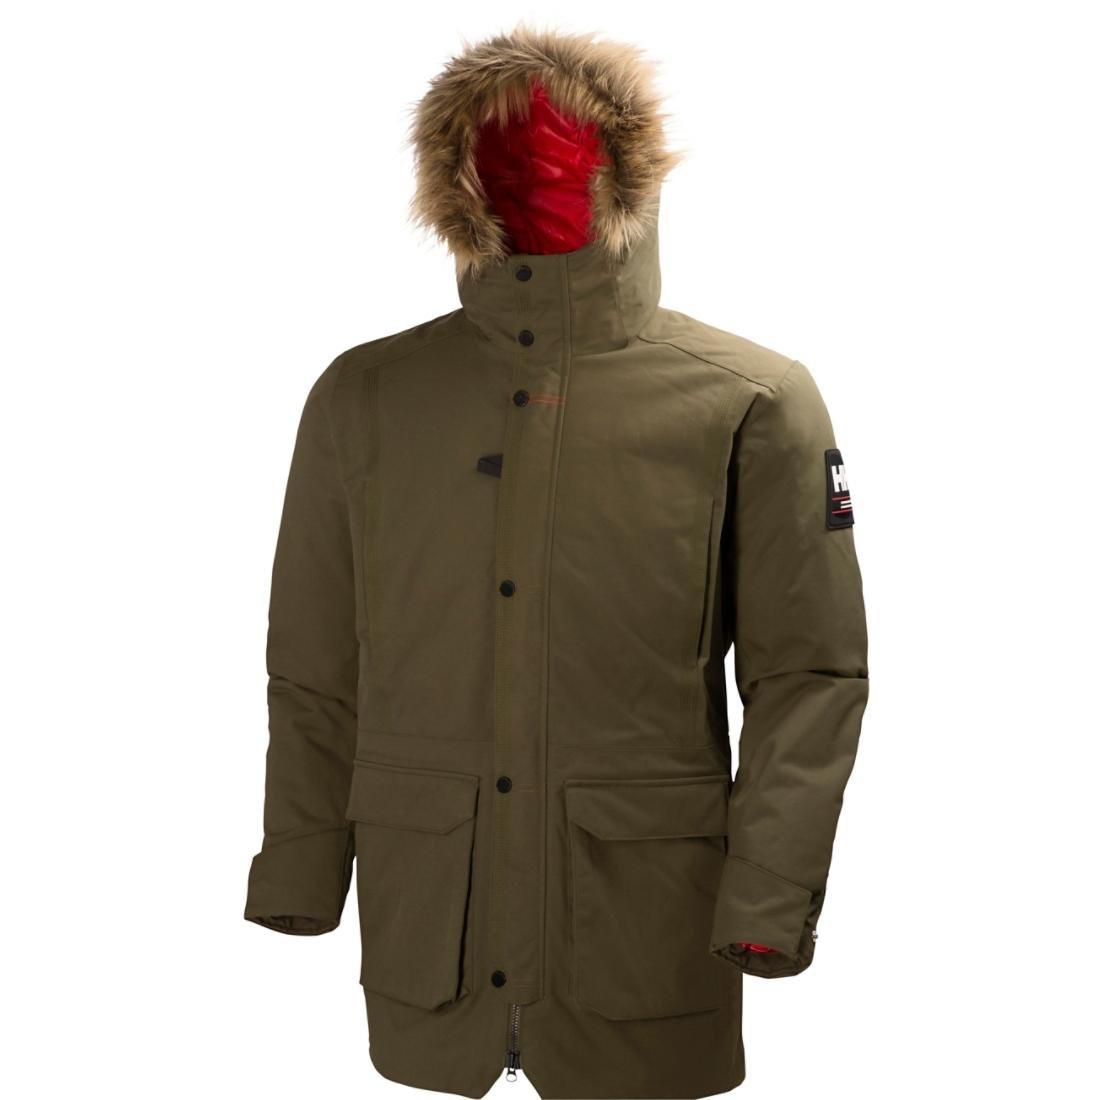 Amazon.com: Helly Hansen Men's Norse Parka Jacket, Olive Night, S ...